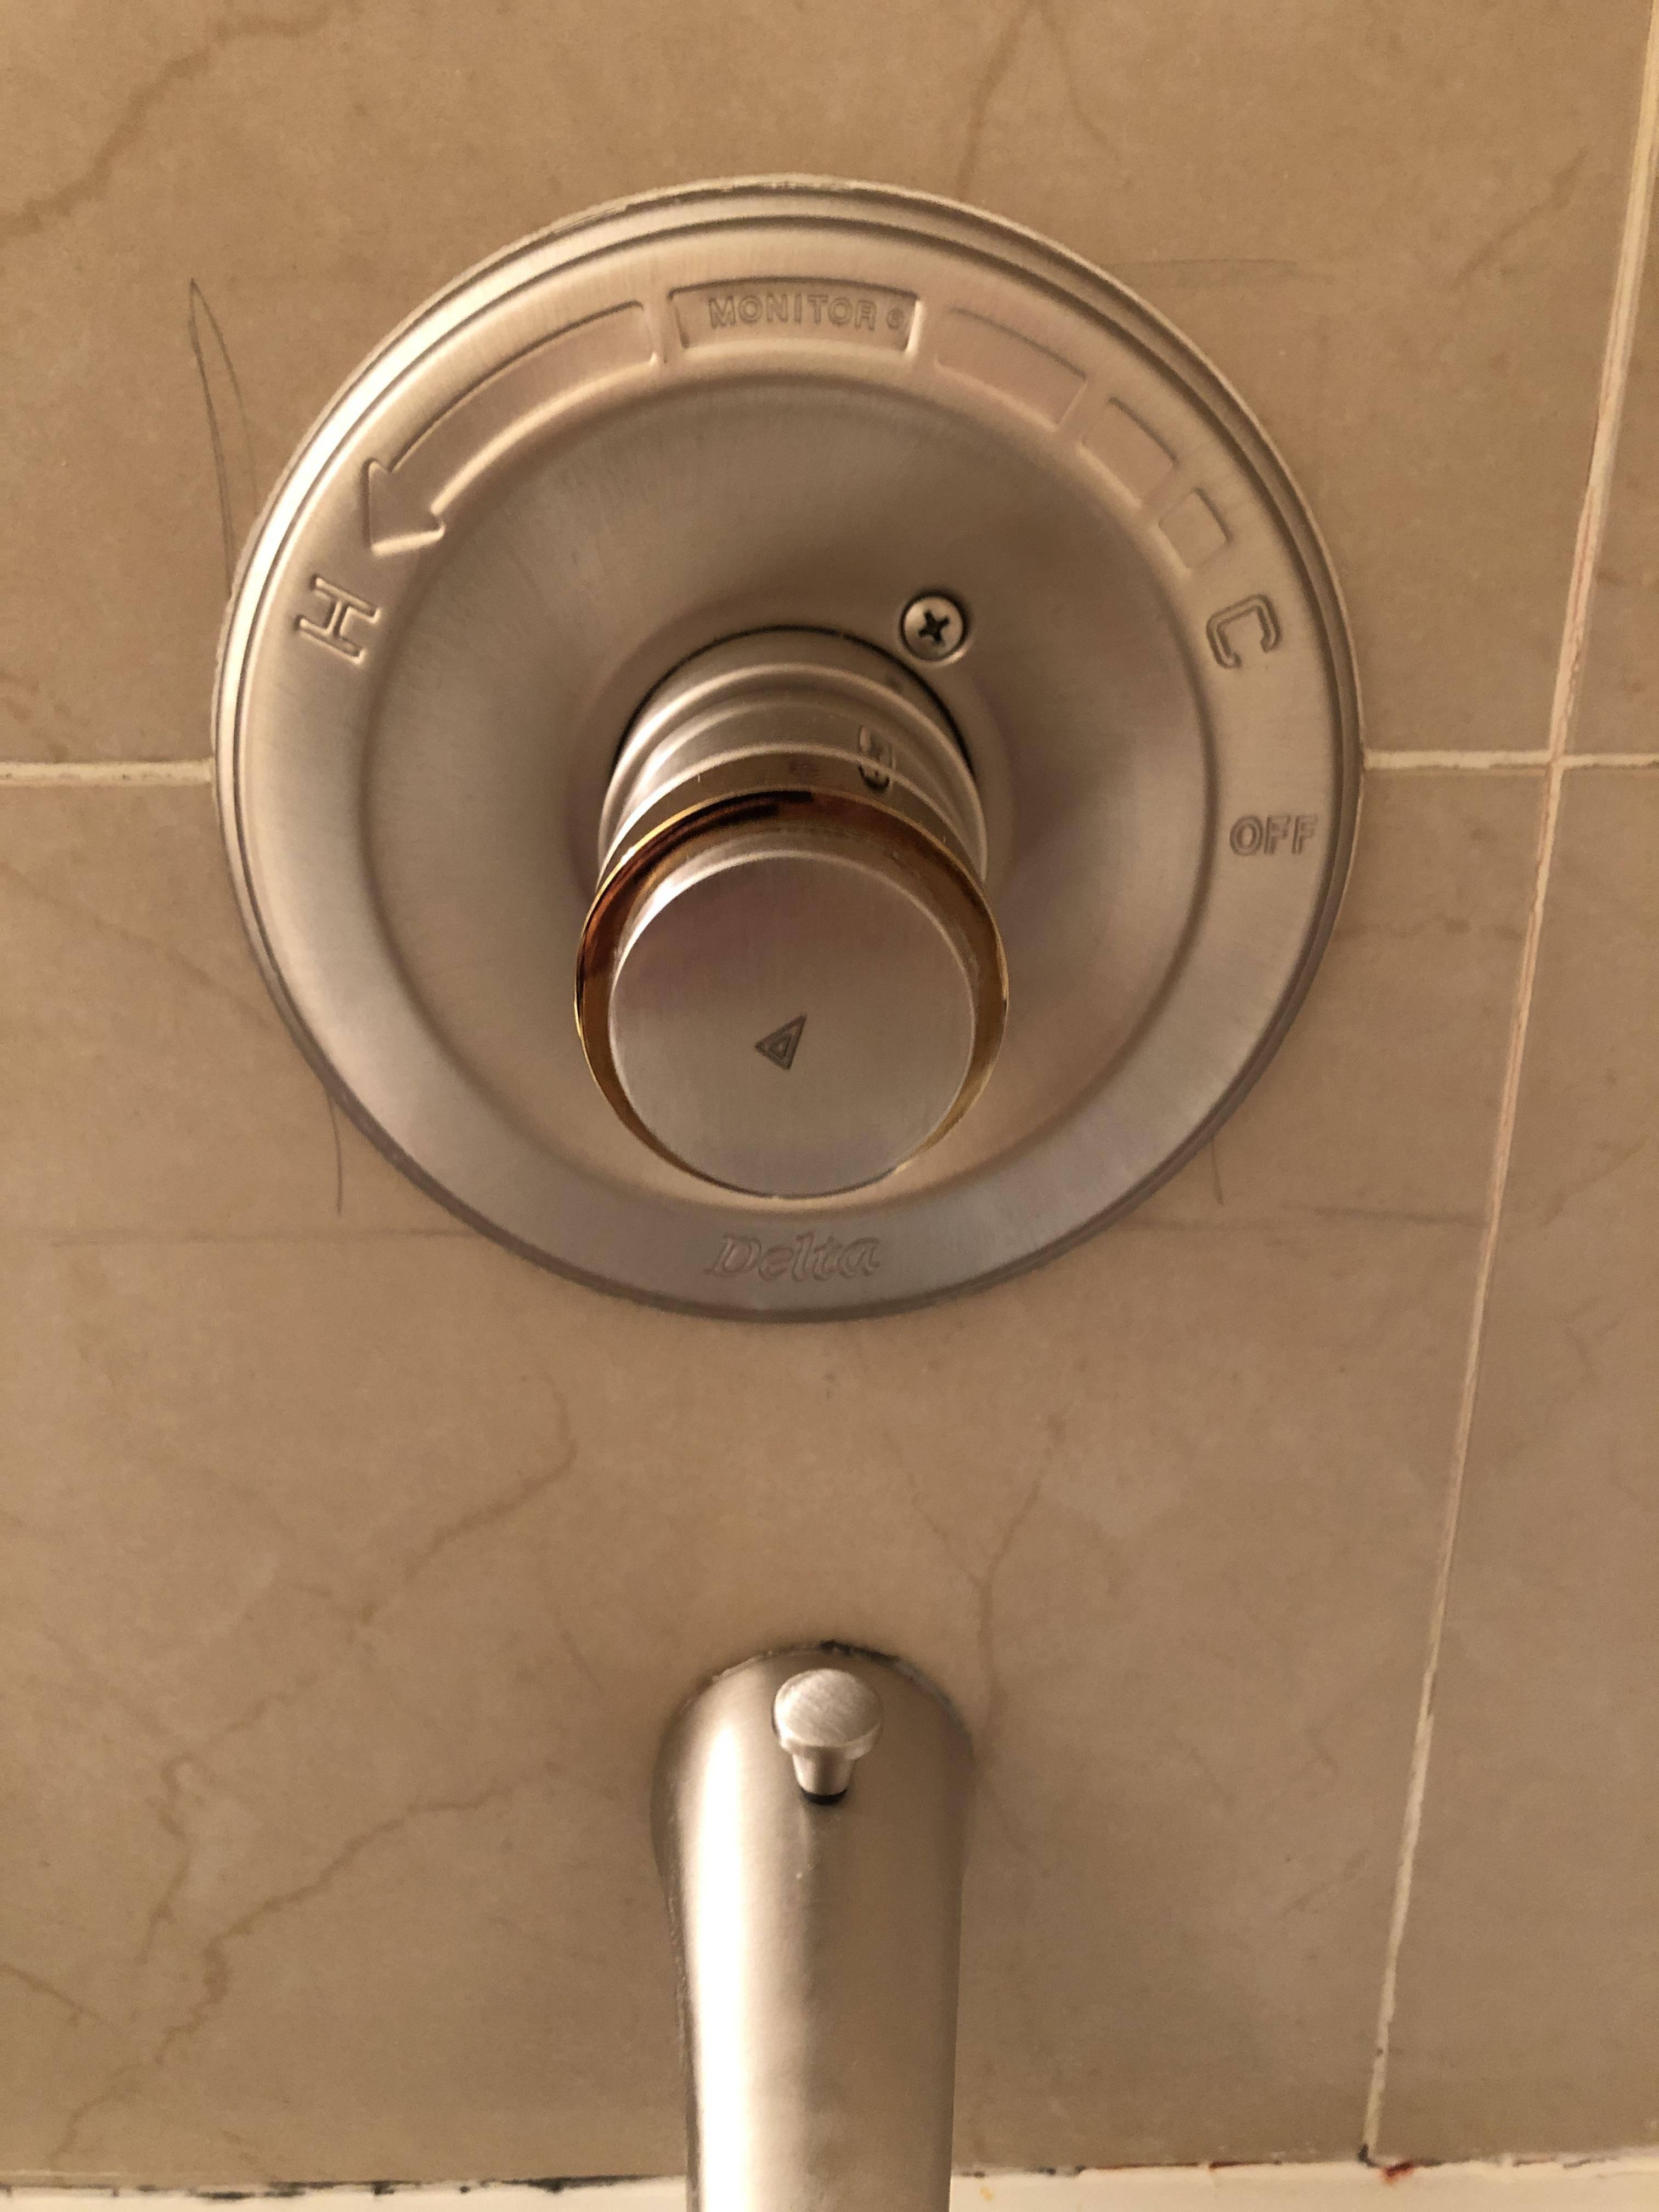 remove caps on circular faucet handles